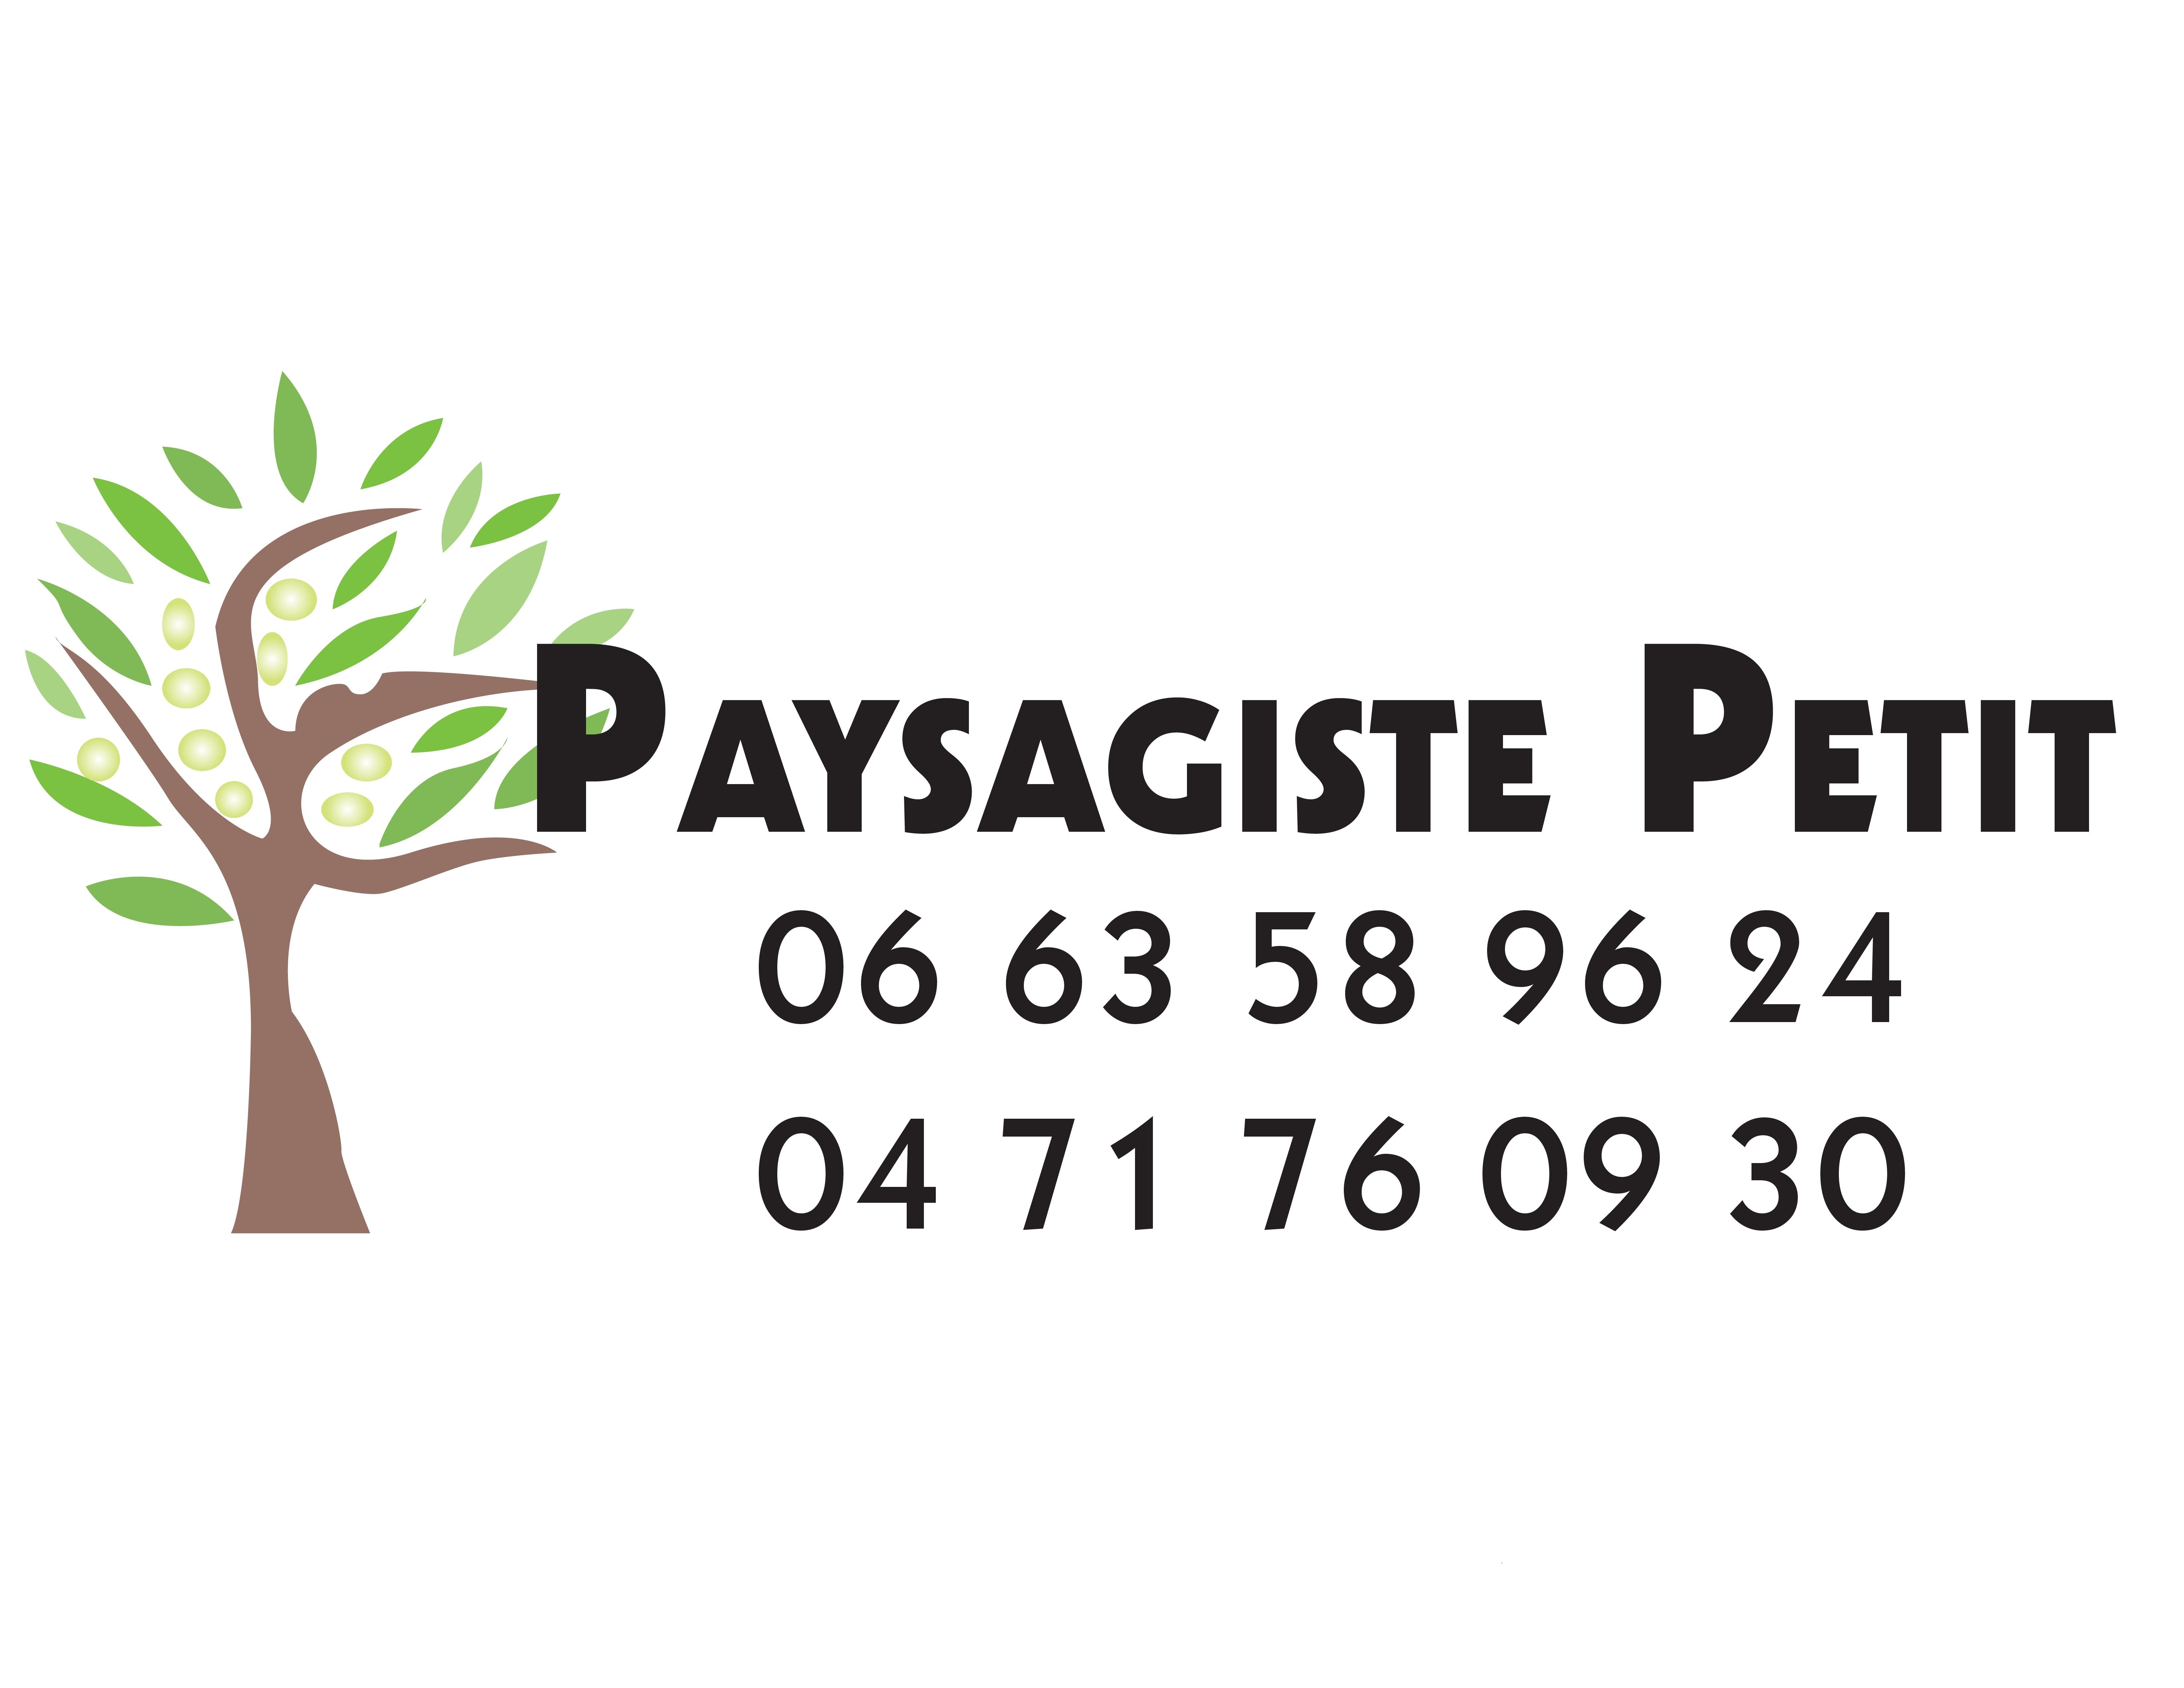 logo paysagiste petit